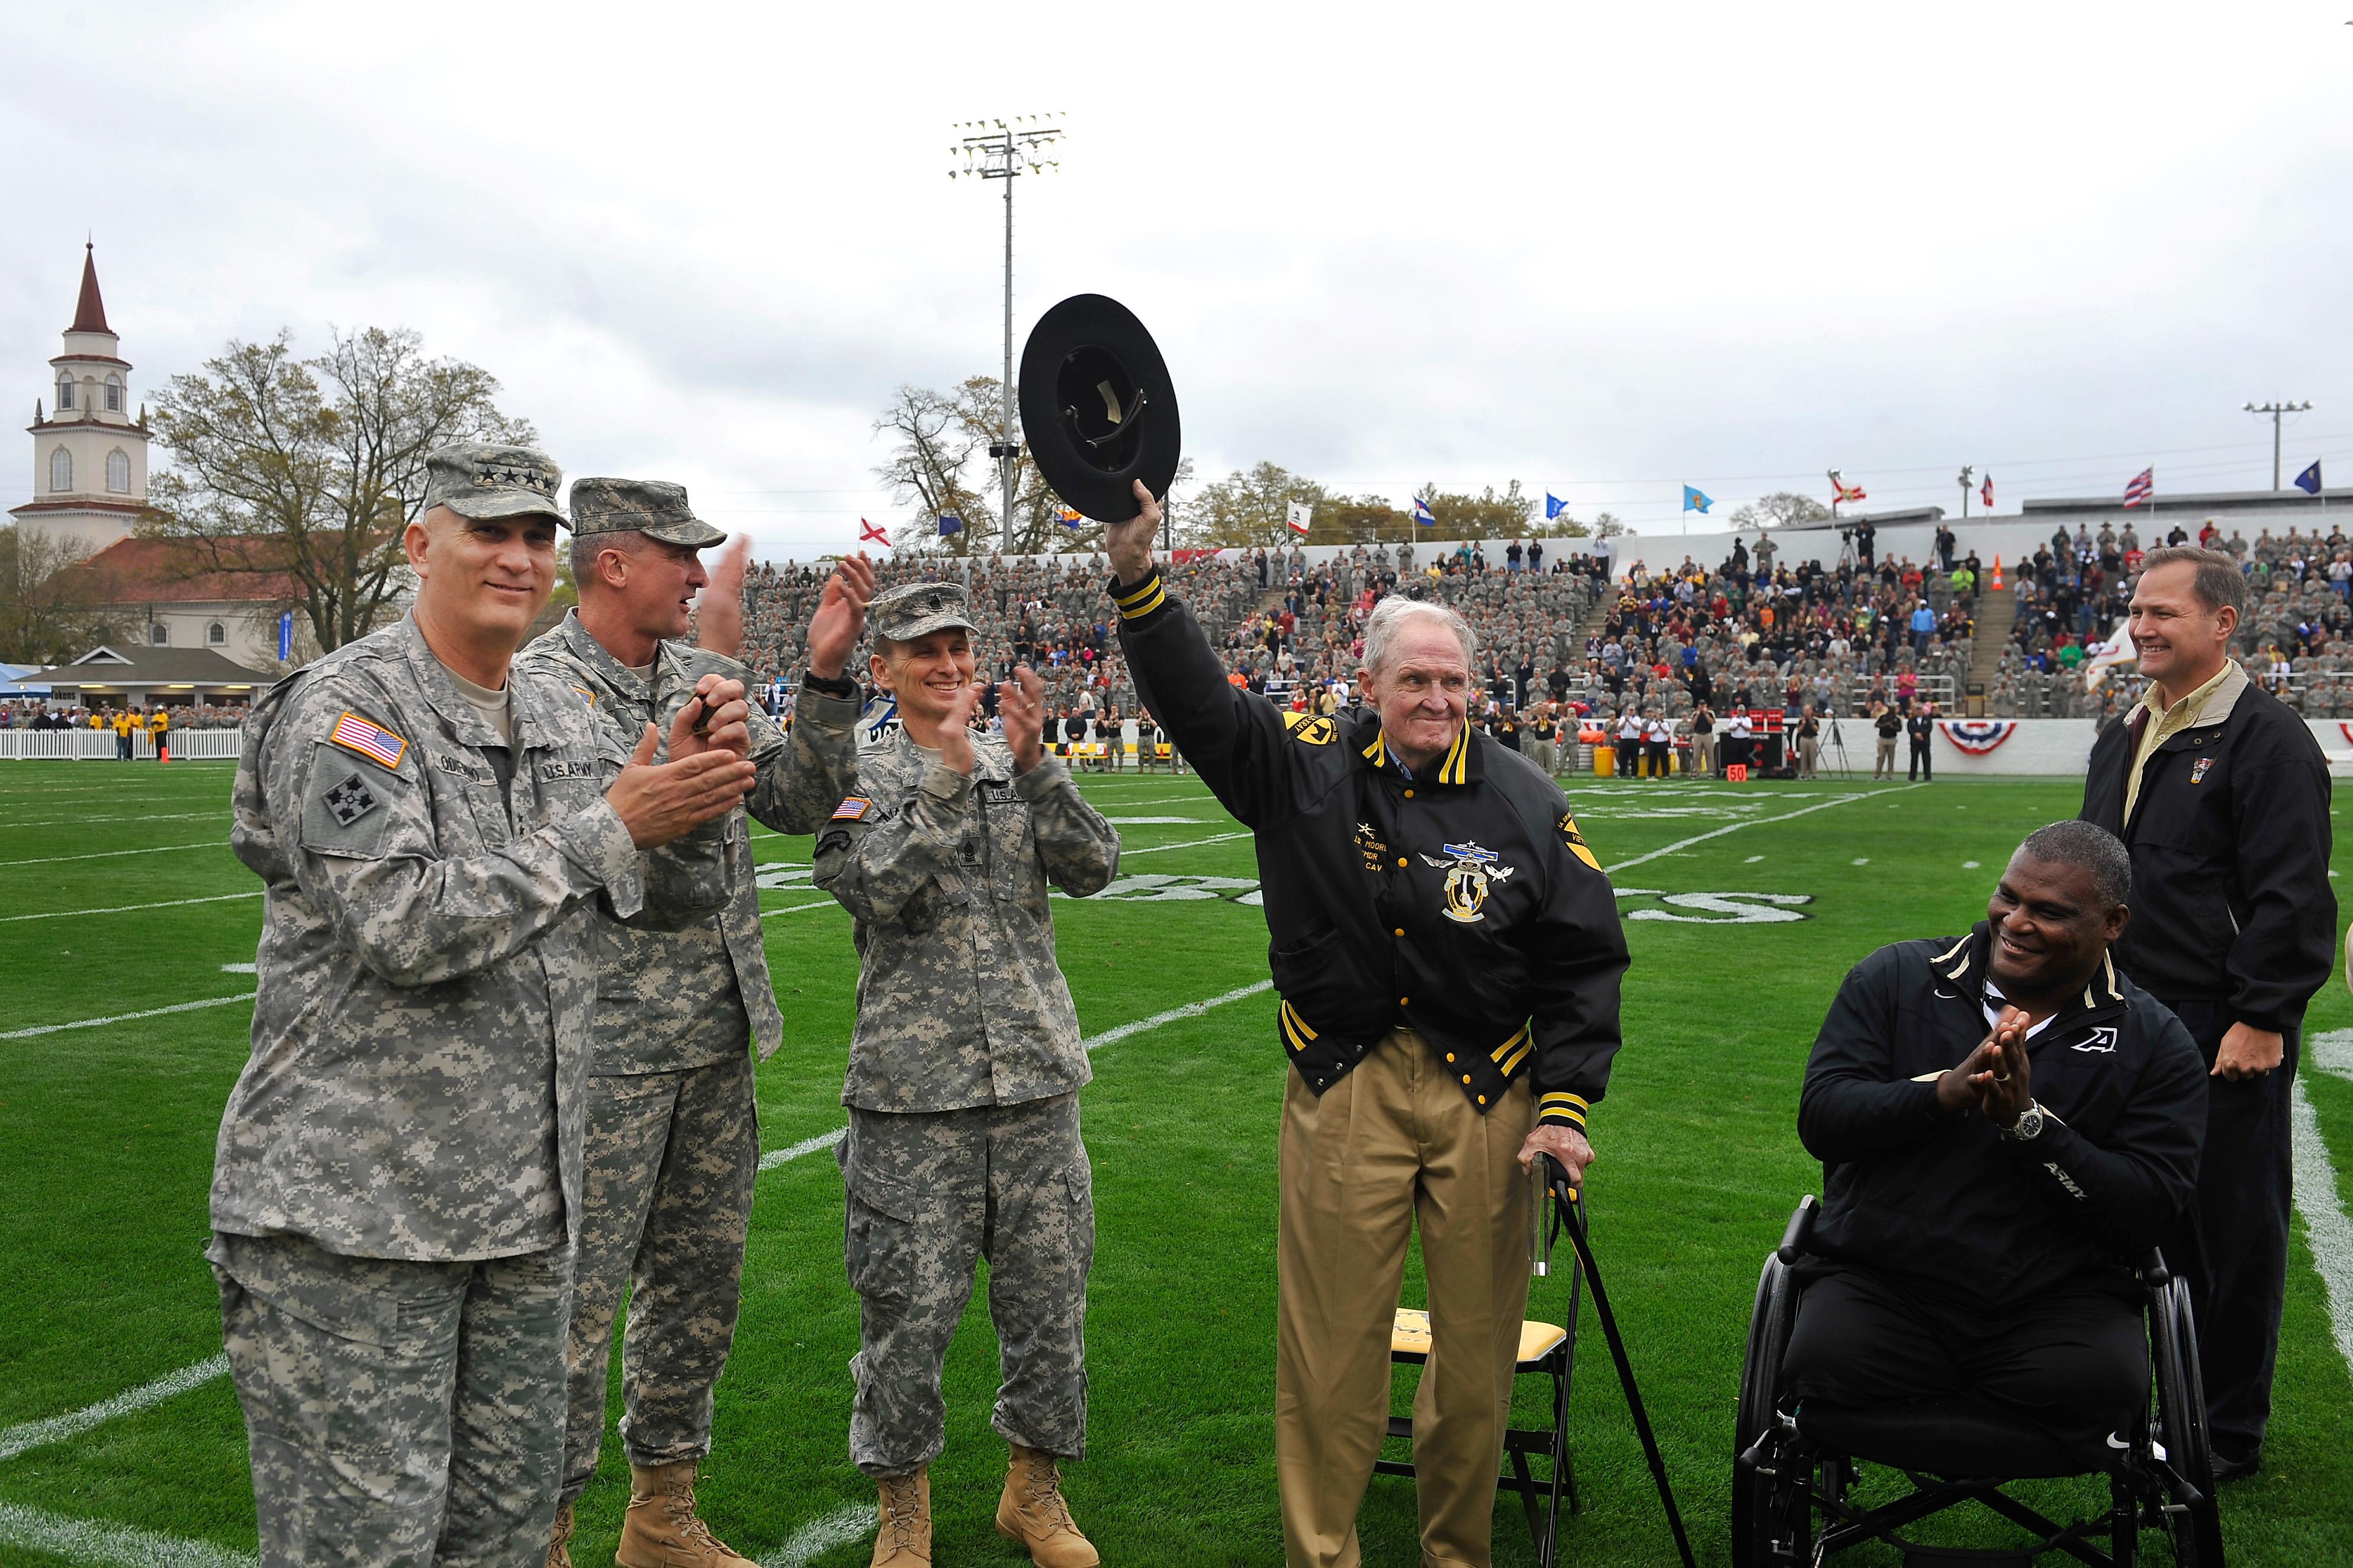 Us department of defense photos photo gallery army chief of staff raymond t odierno maj gen robert b altavistaventures Gallery